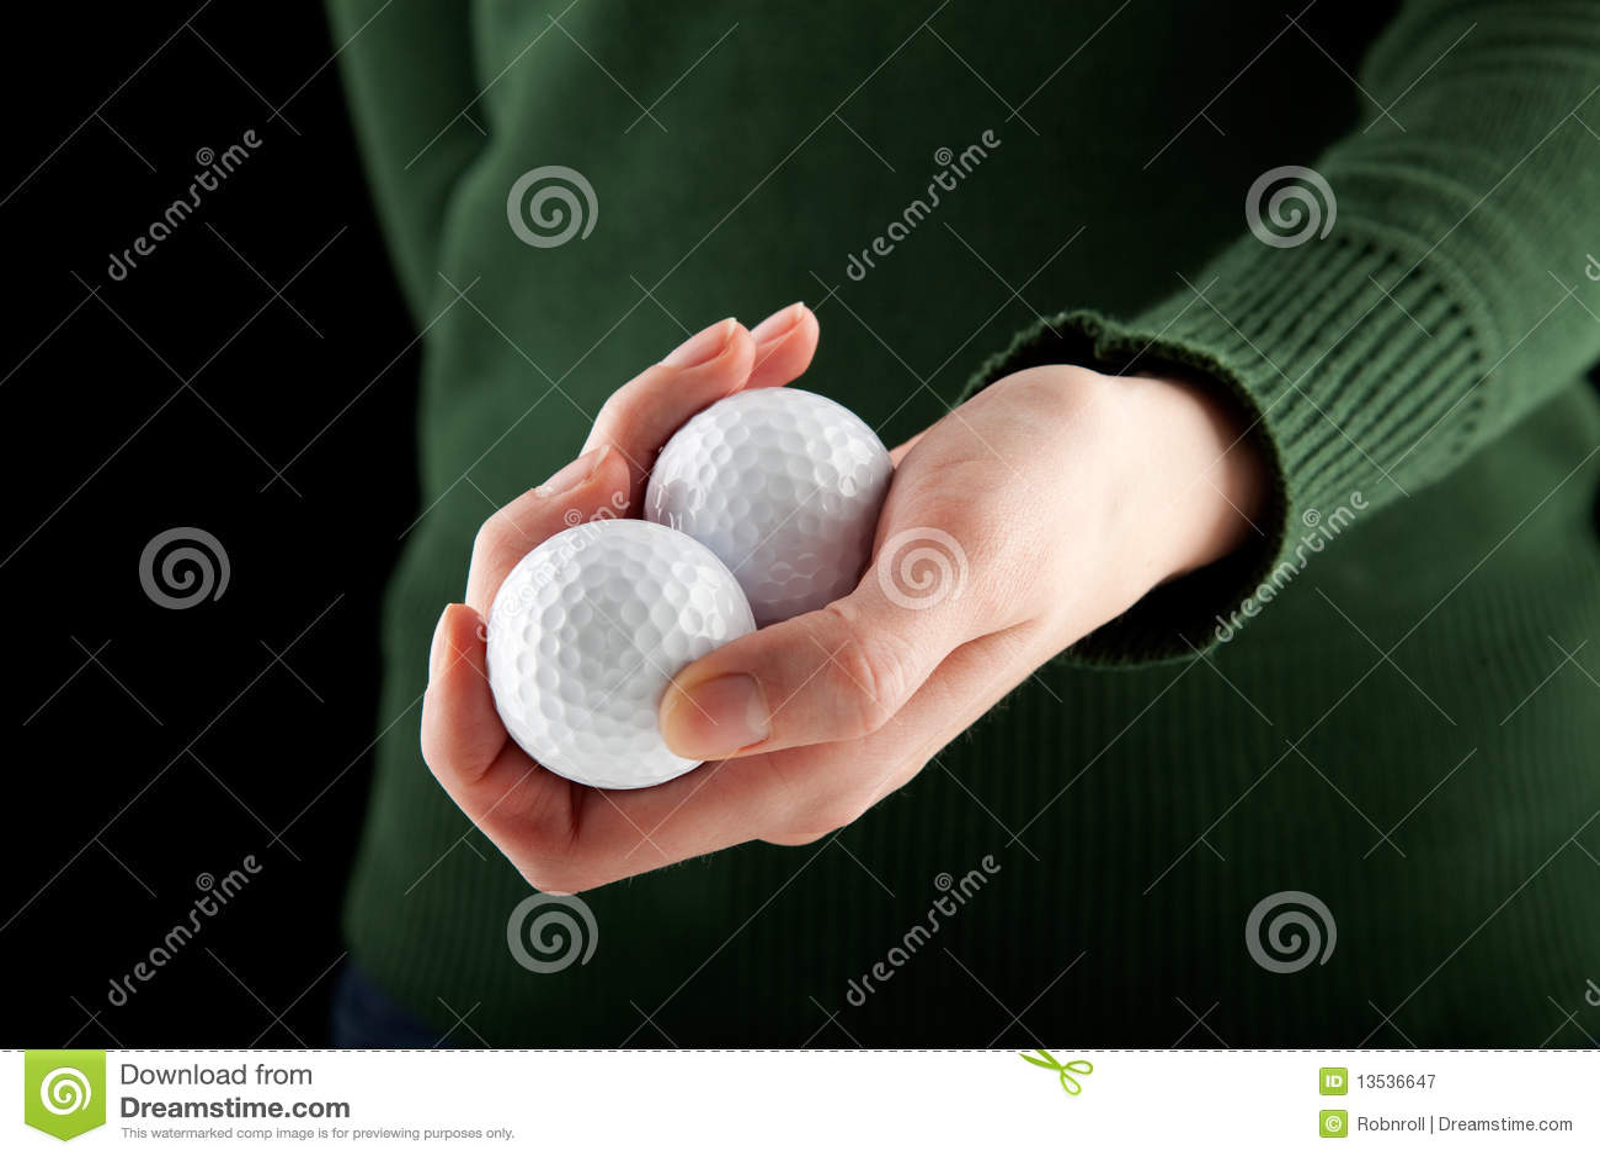 2 hands holding ball